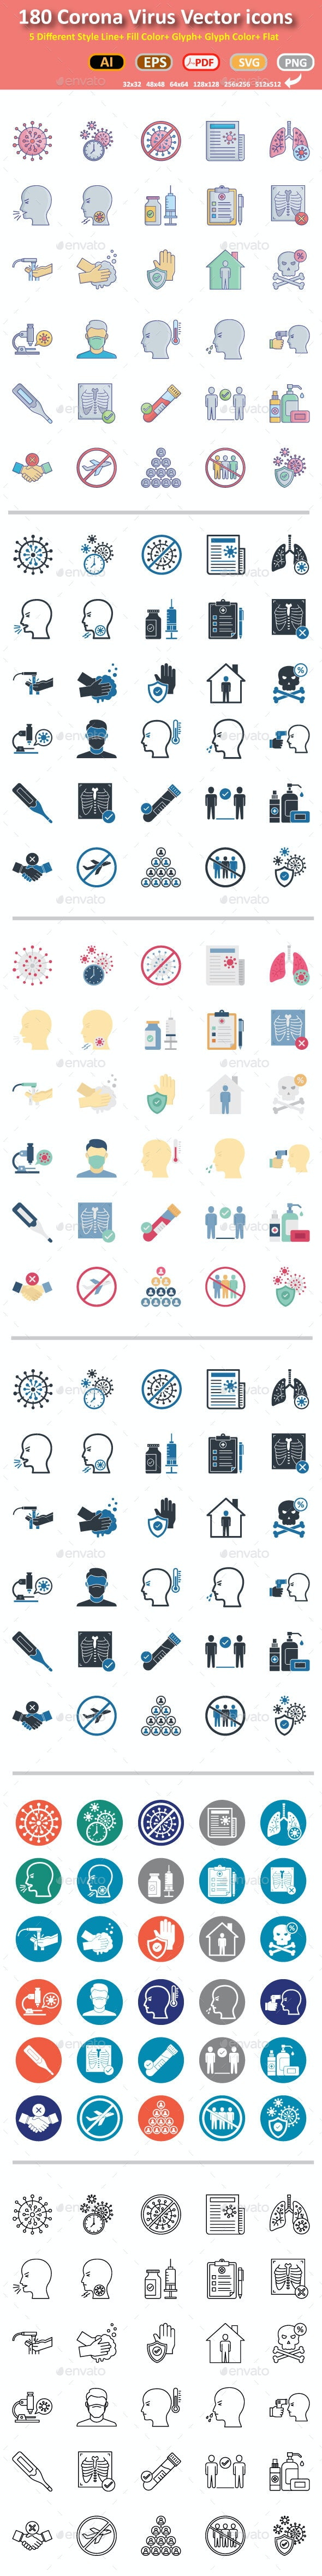 Coronavirus Vector icons - Icons